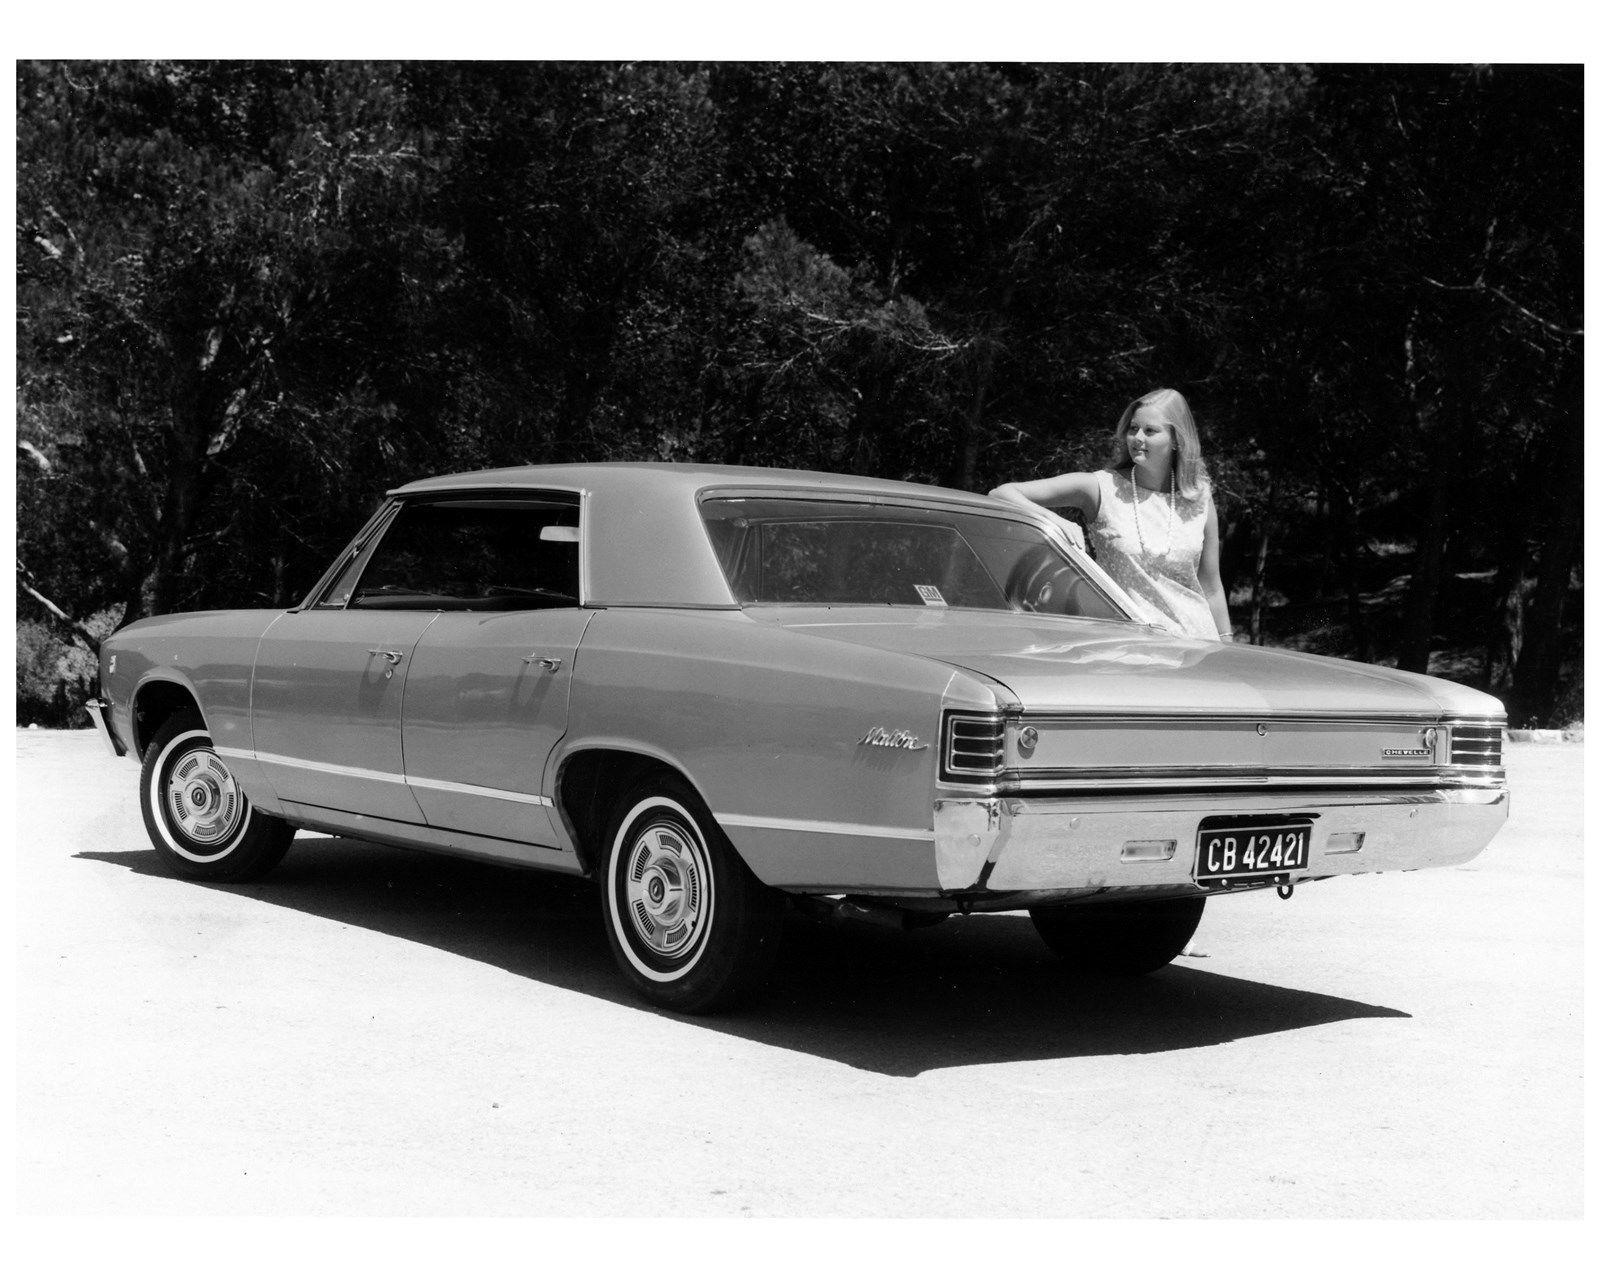 1967 Chevrolet South Africa Chevelle Malibu Sport Factory Photo